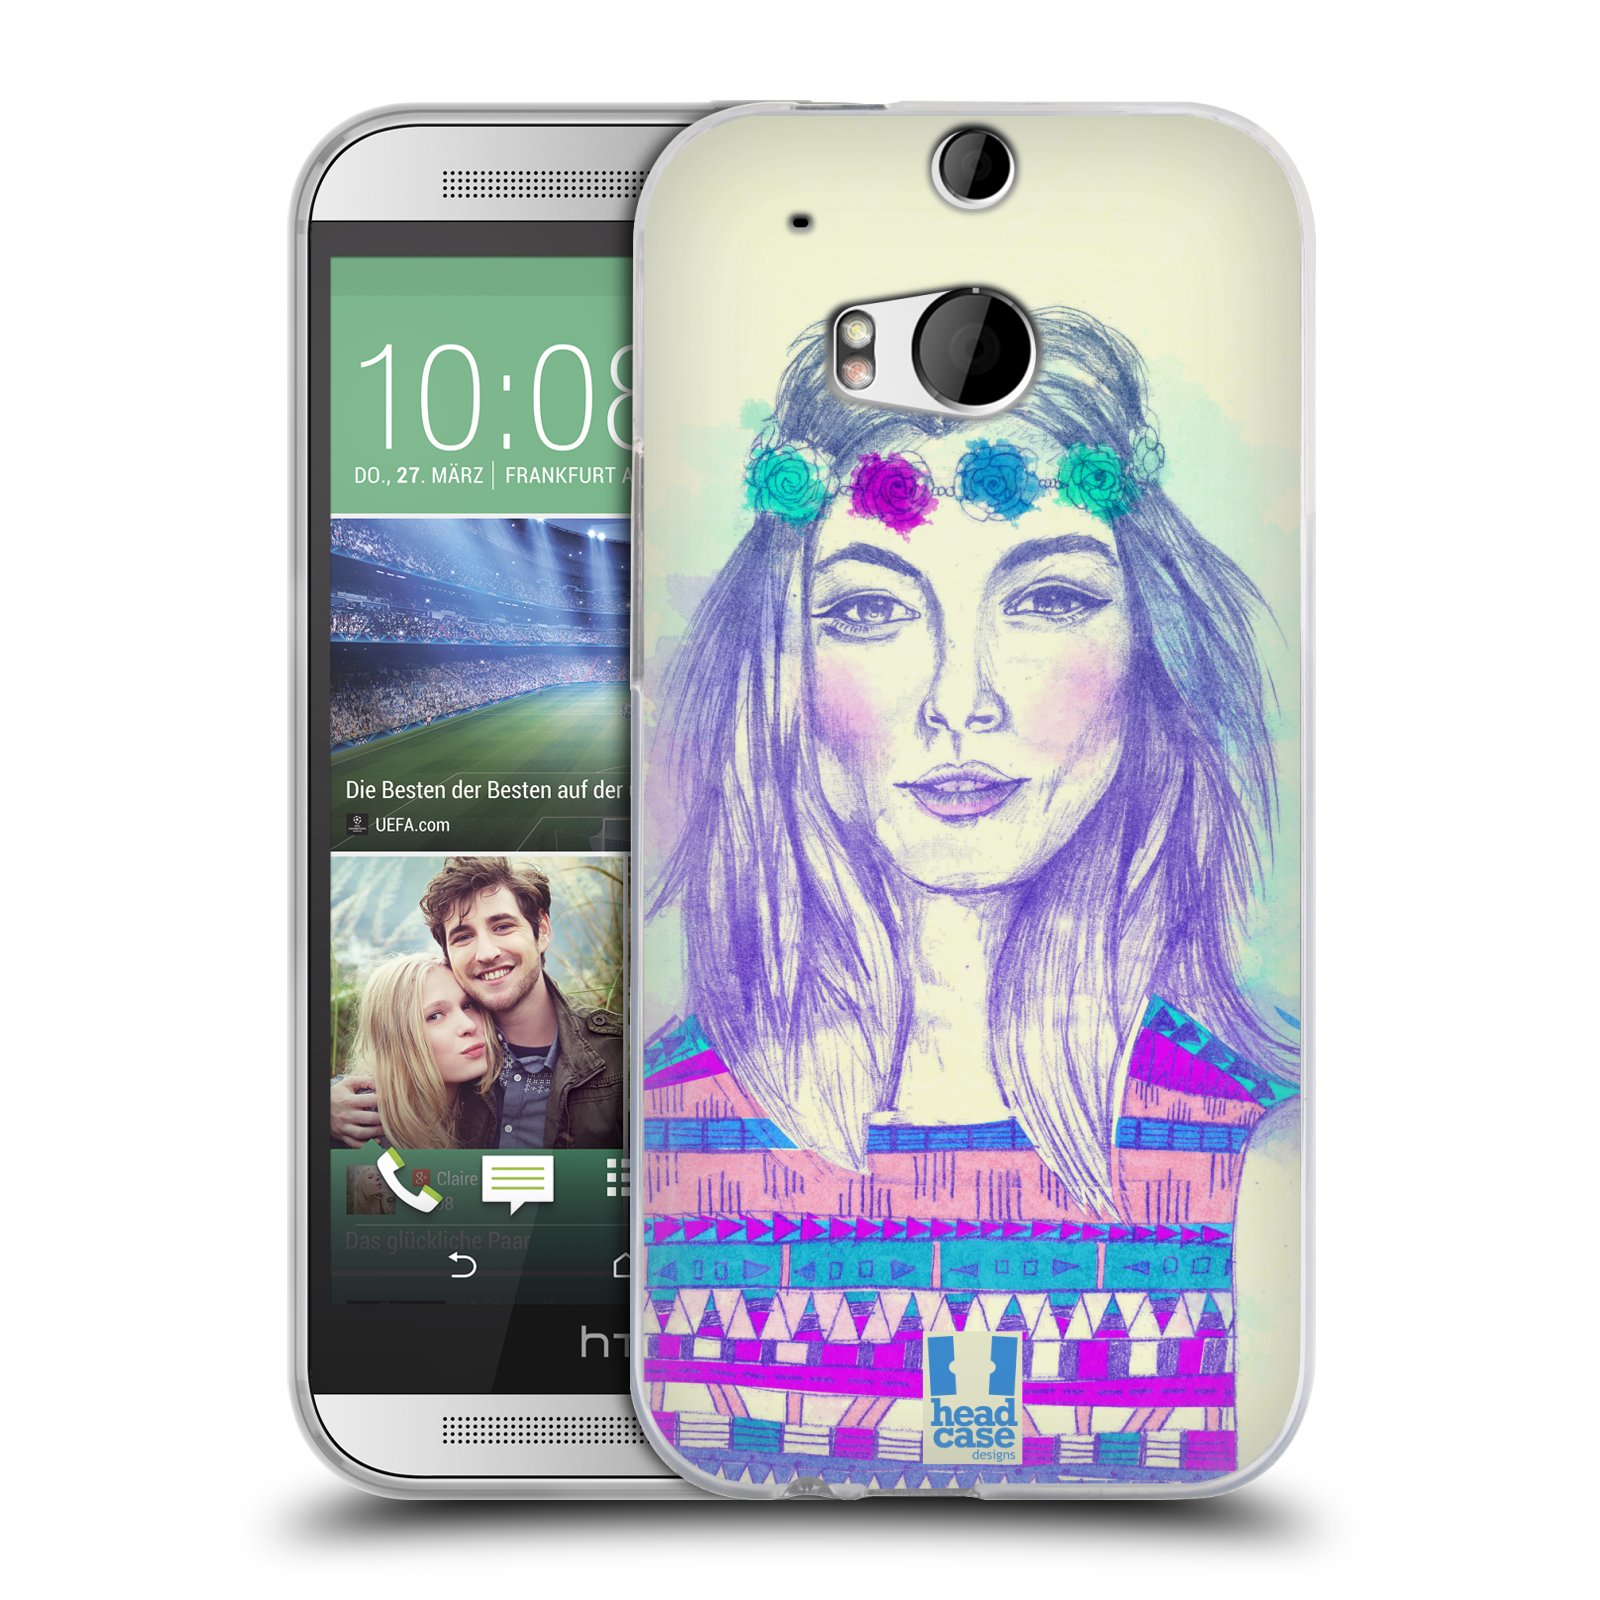 HEAD CASE silikonový obal na mobil HTC ONE (M8) vzor Dívka dlouhé květinové vlasy HIPPIE modrá